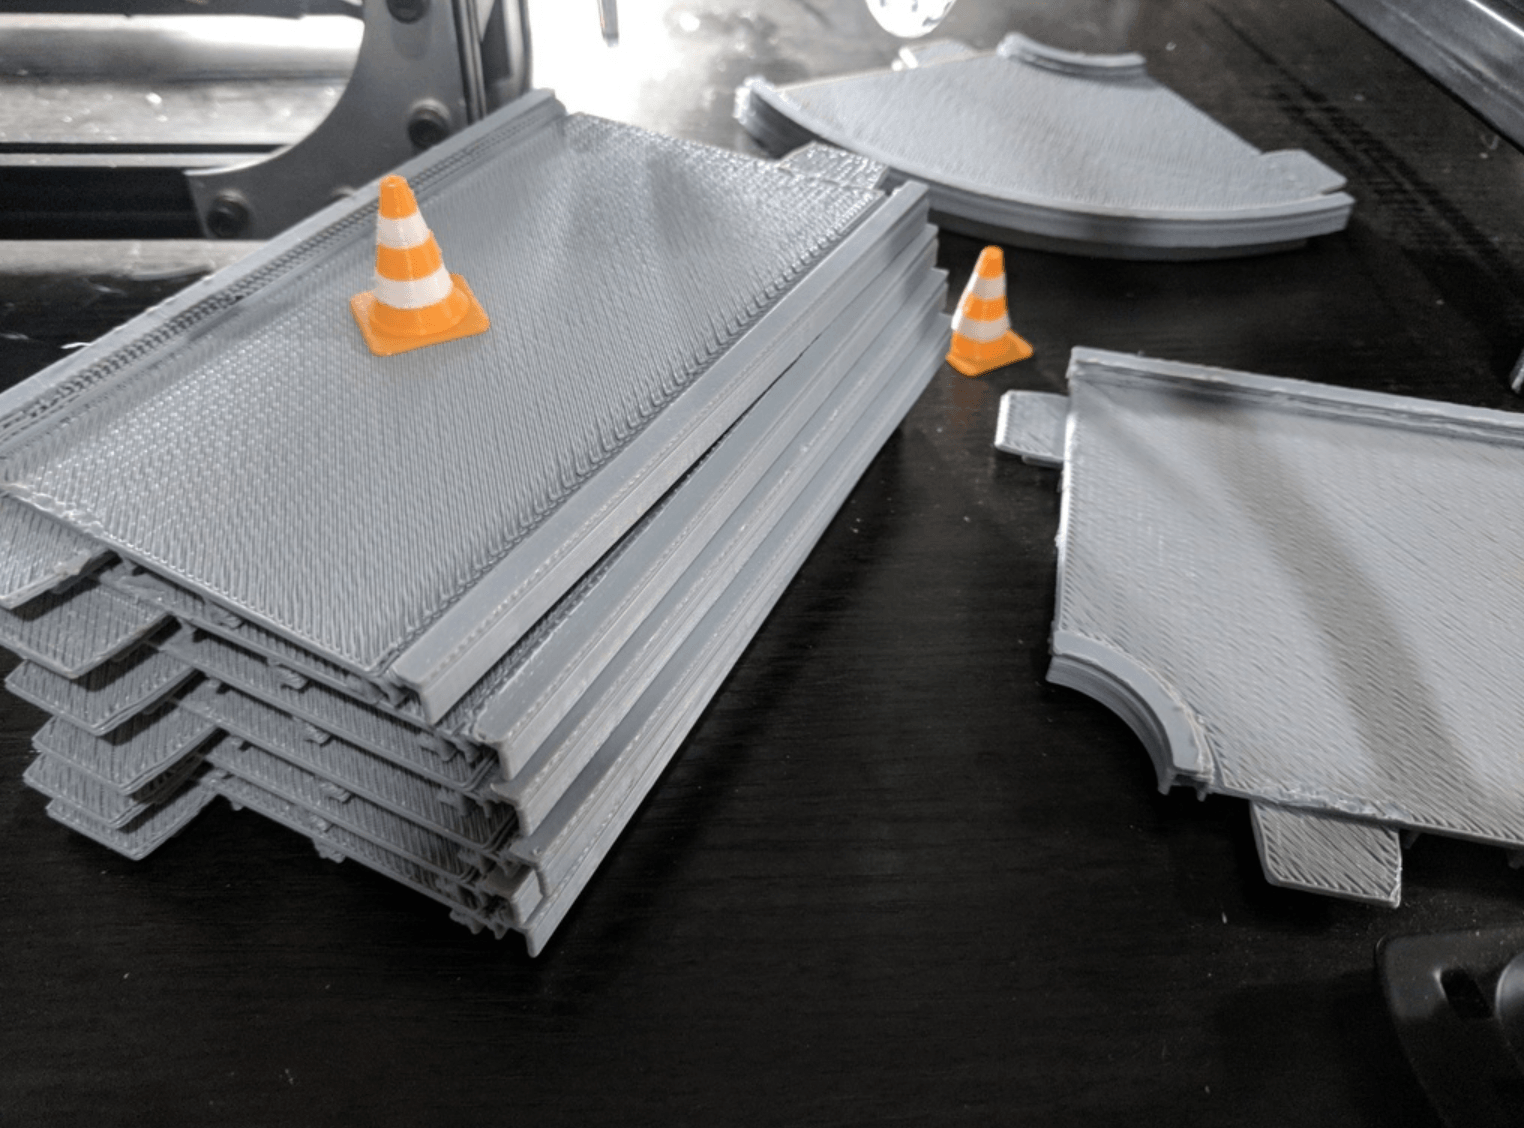 Capture d'écran 2018-05-14 à 15.20.13.png Download free STL file Press Fit Hotwheels Roads • Model to 3D print, sjpiper145